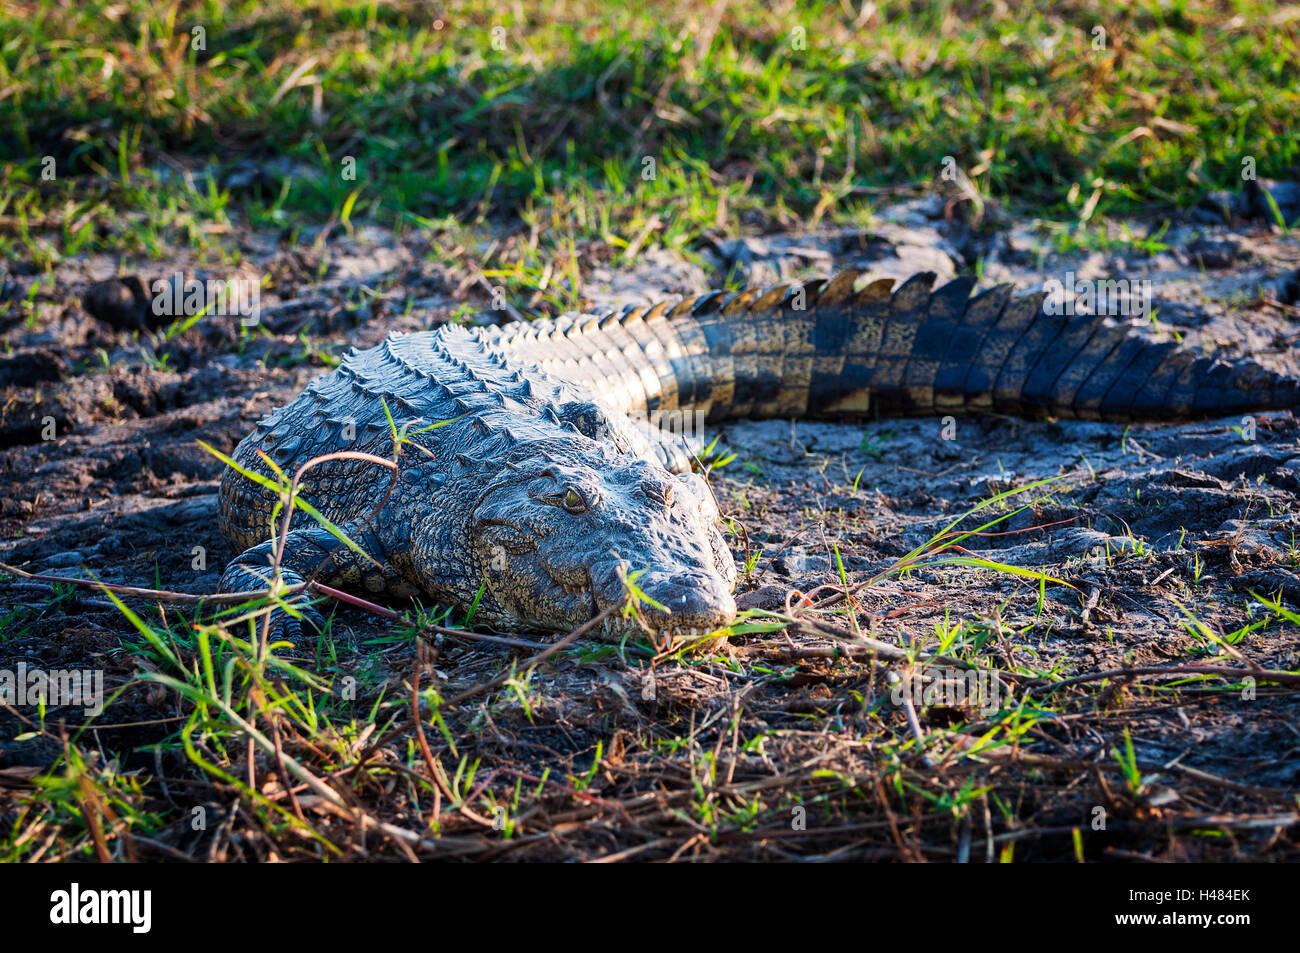 Nile crocodile in the banks of the Chobe river, Chobe National Park, in Botswana, Africa; - Stock Image